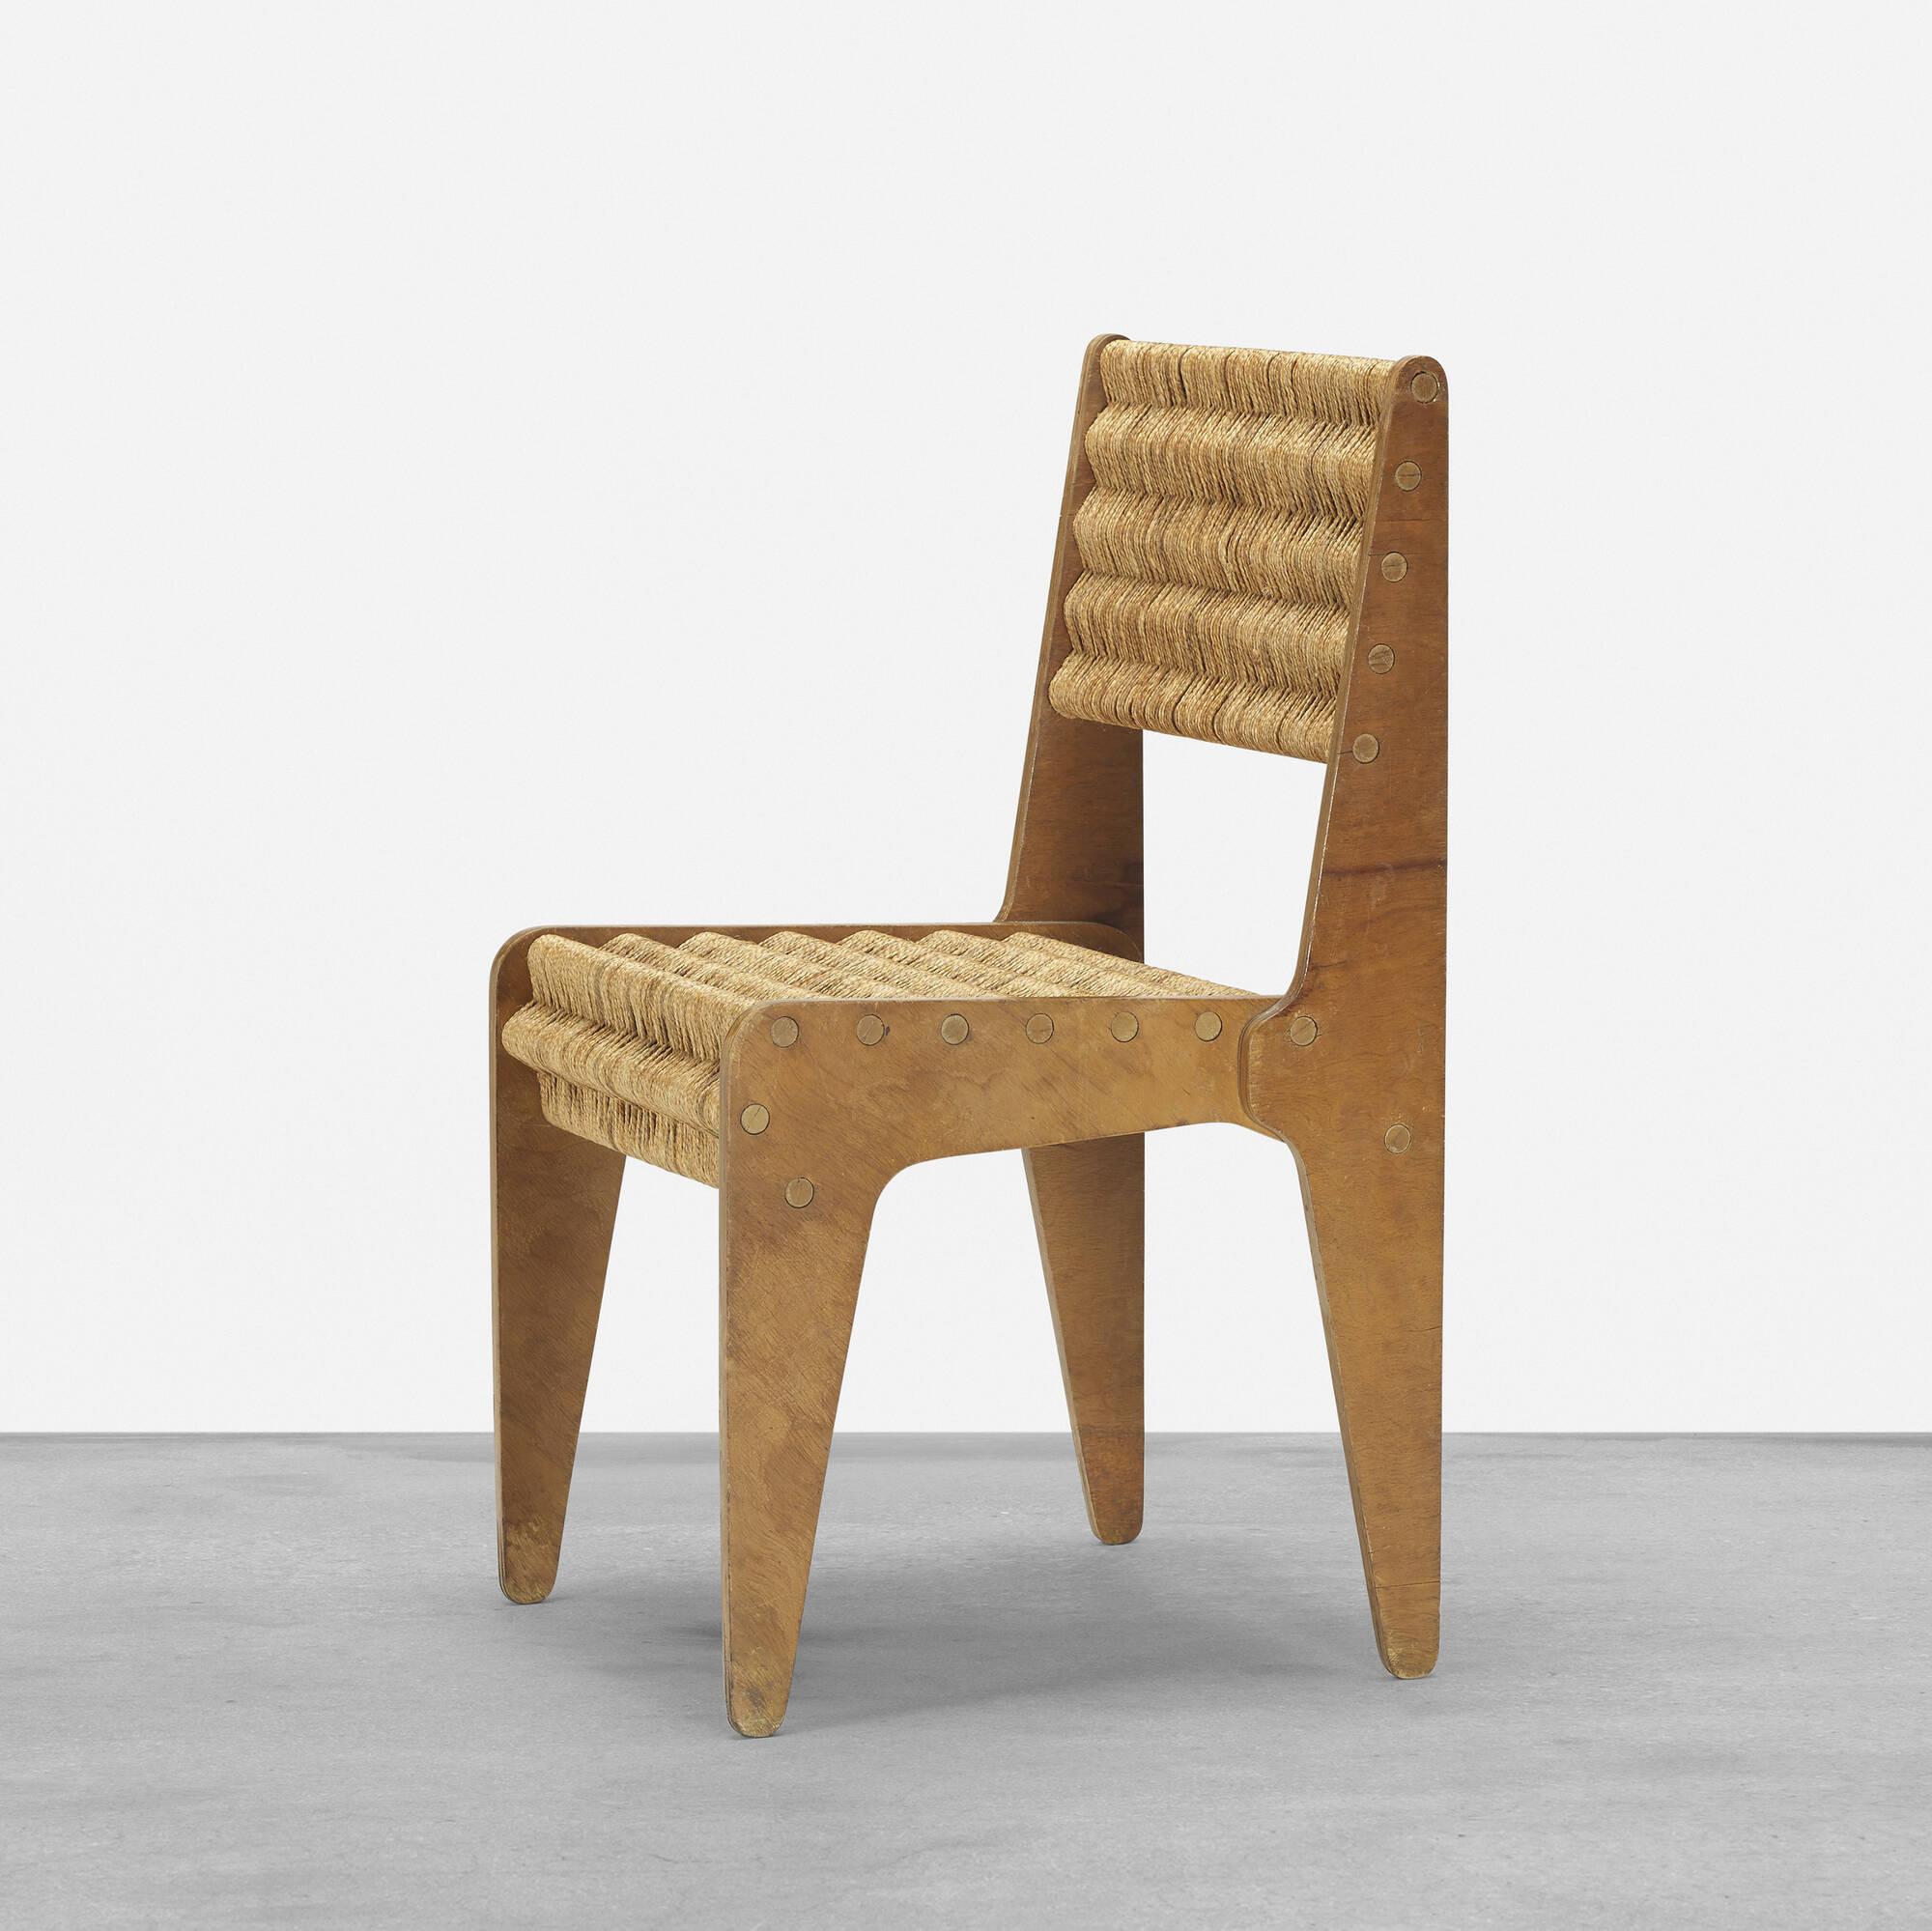 279 marcel breuer important prototype chair for bryn mawr. Black Bedroom Furniture Sets. Home Design Ideas